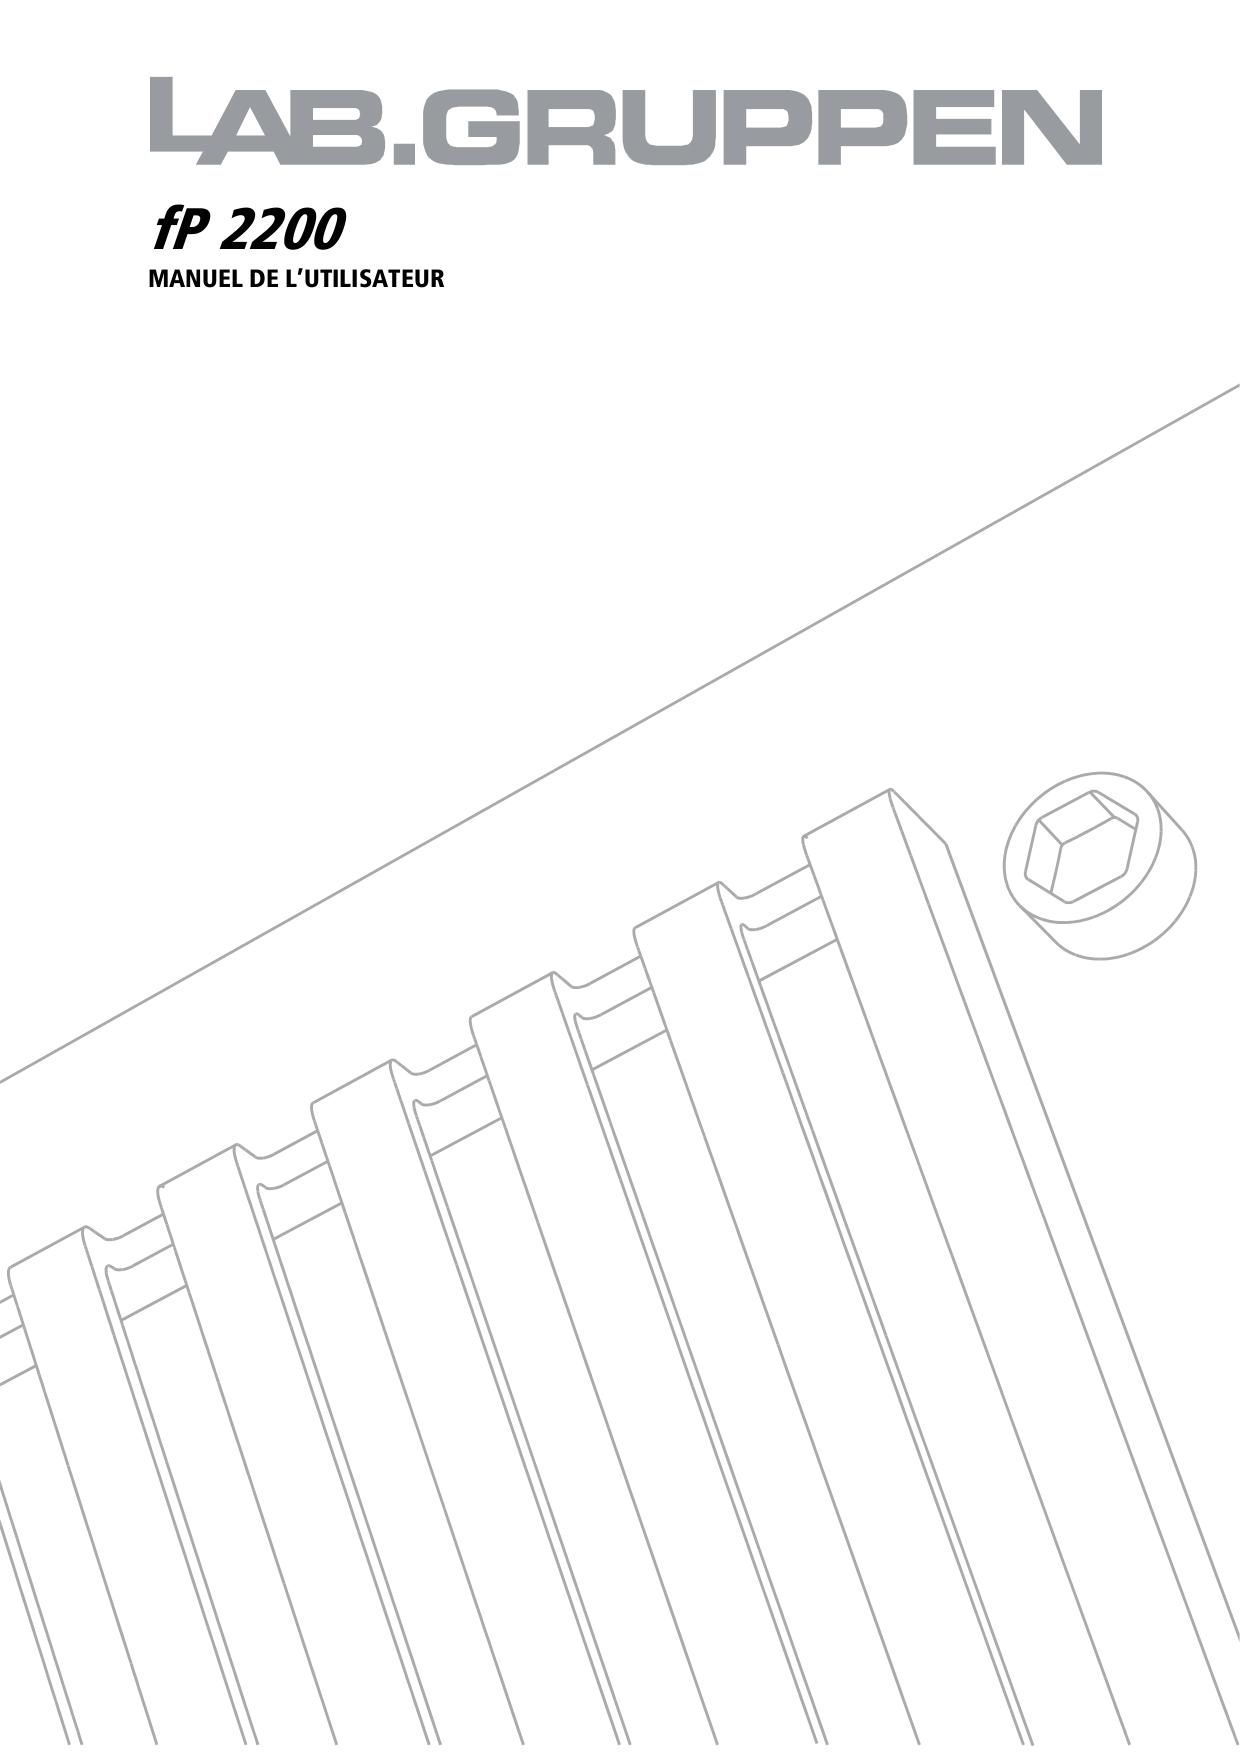 pdf for Lab.gruppen Car Amplifier FP 2200 manual